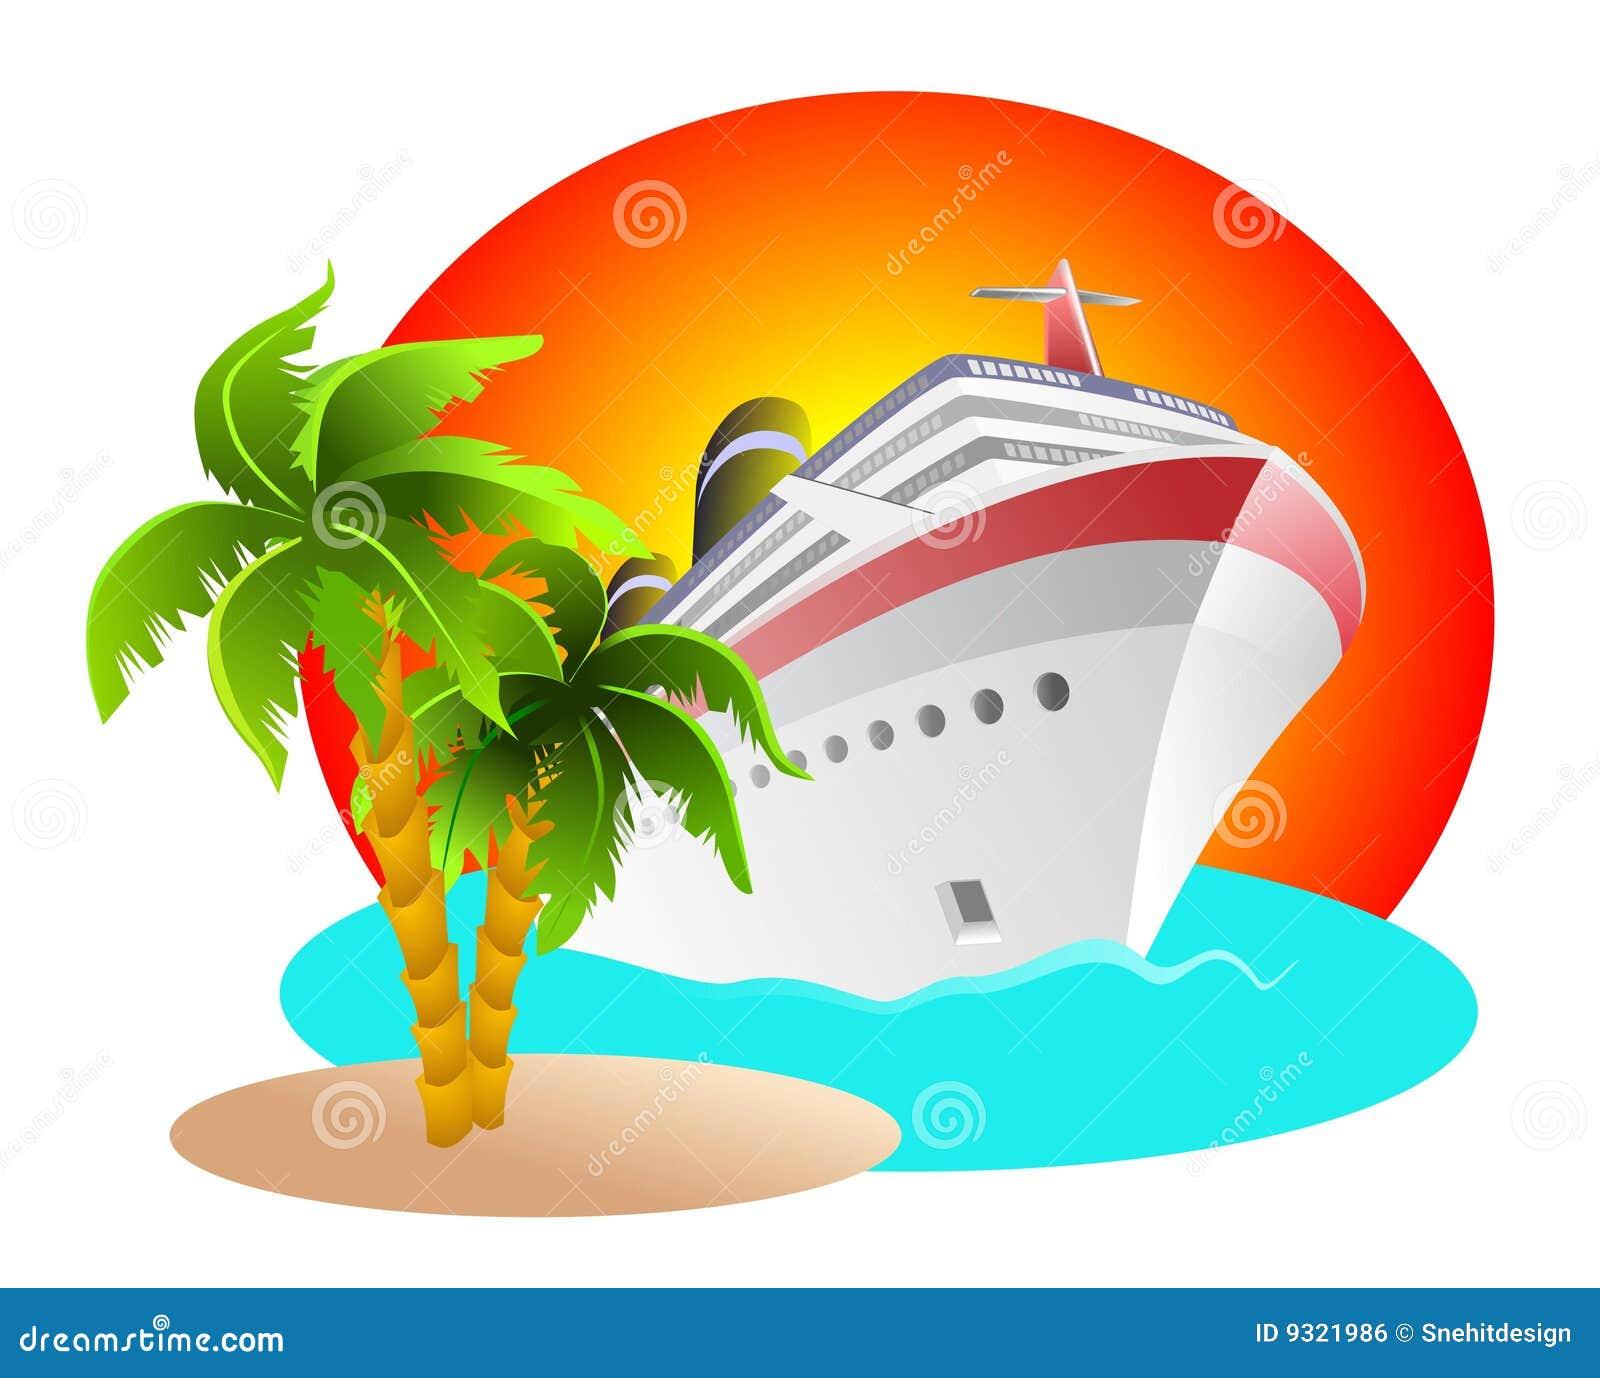 Cruise Clipart Royalty Free Stock Image - Image: 9321986